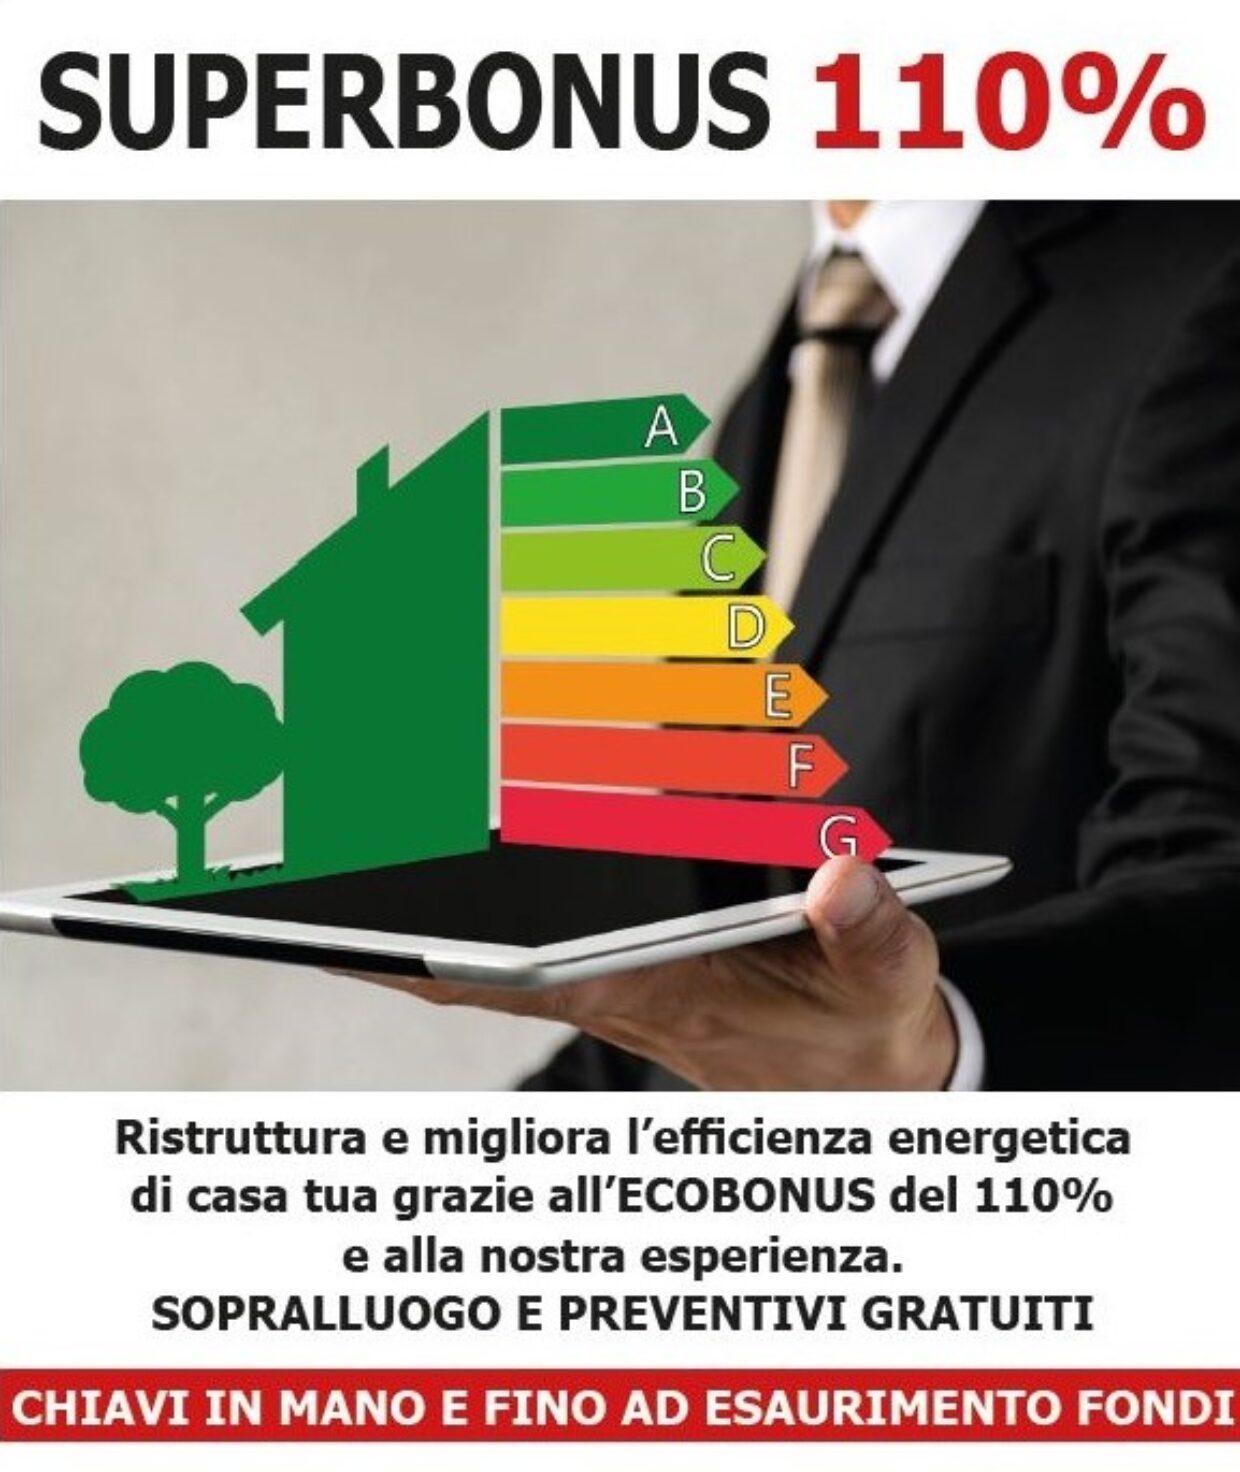 APPROFITTA ADESSO DEL SUPERBONUS DEL 110%